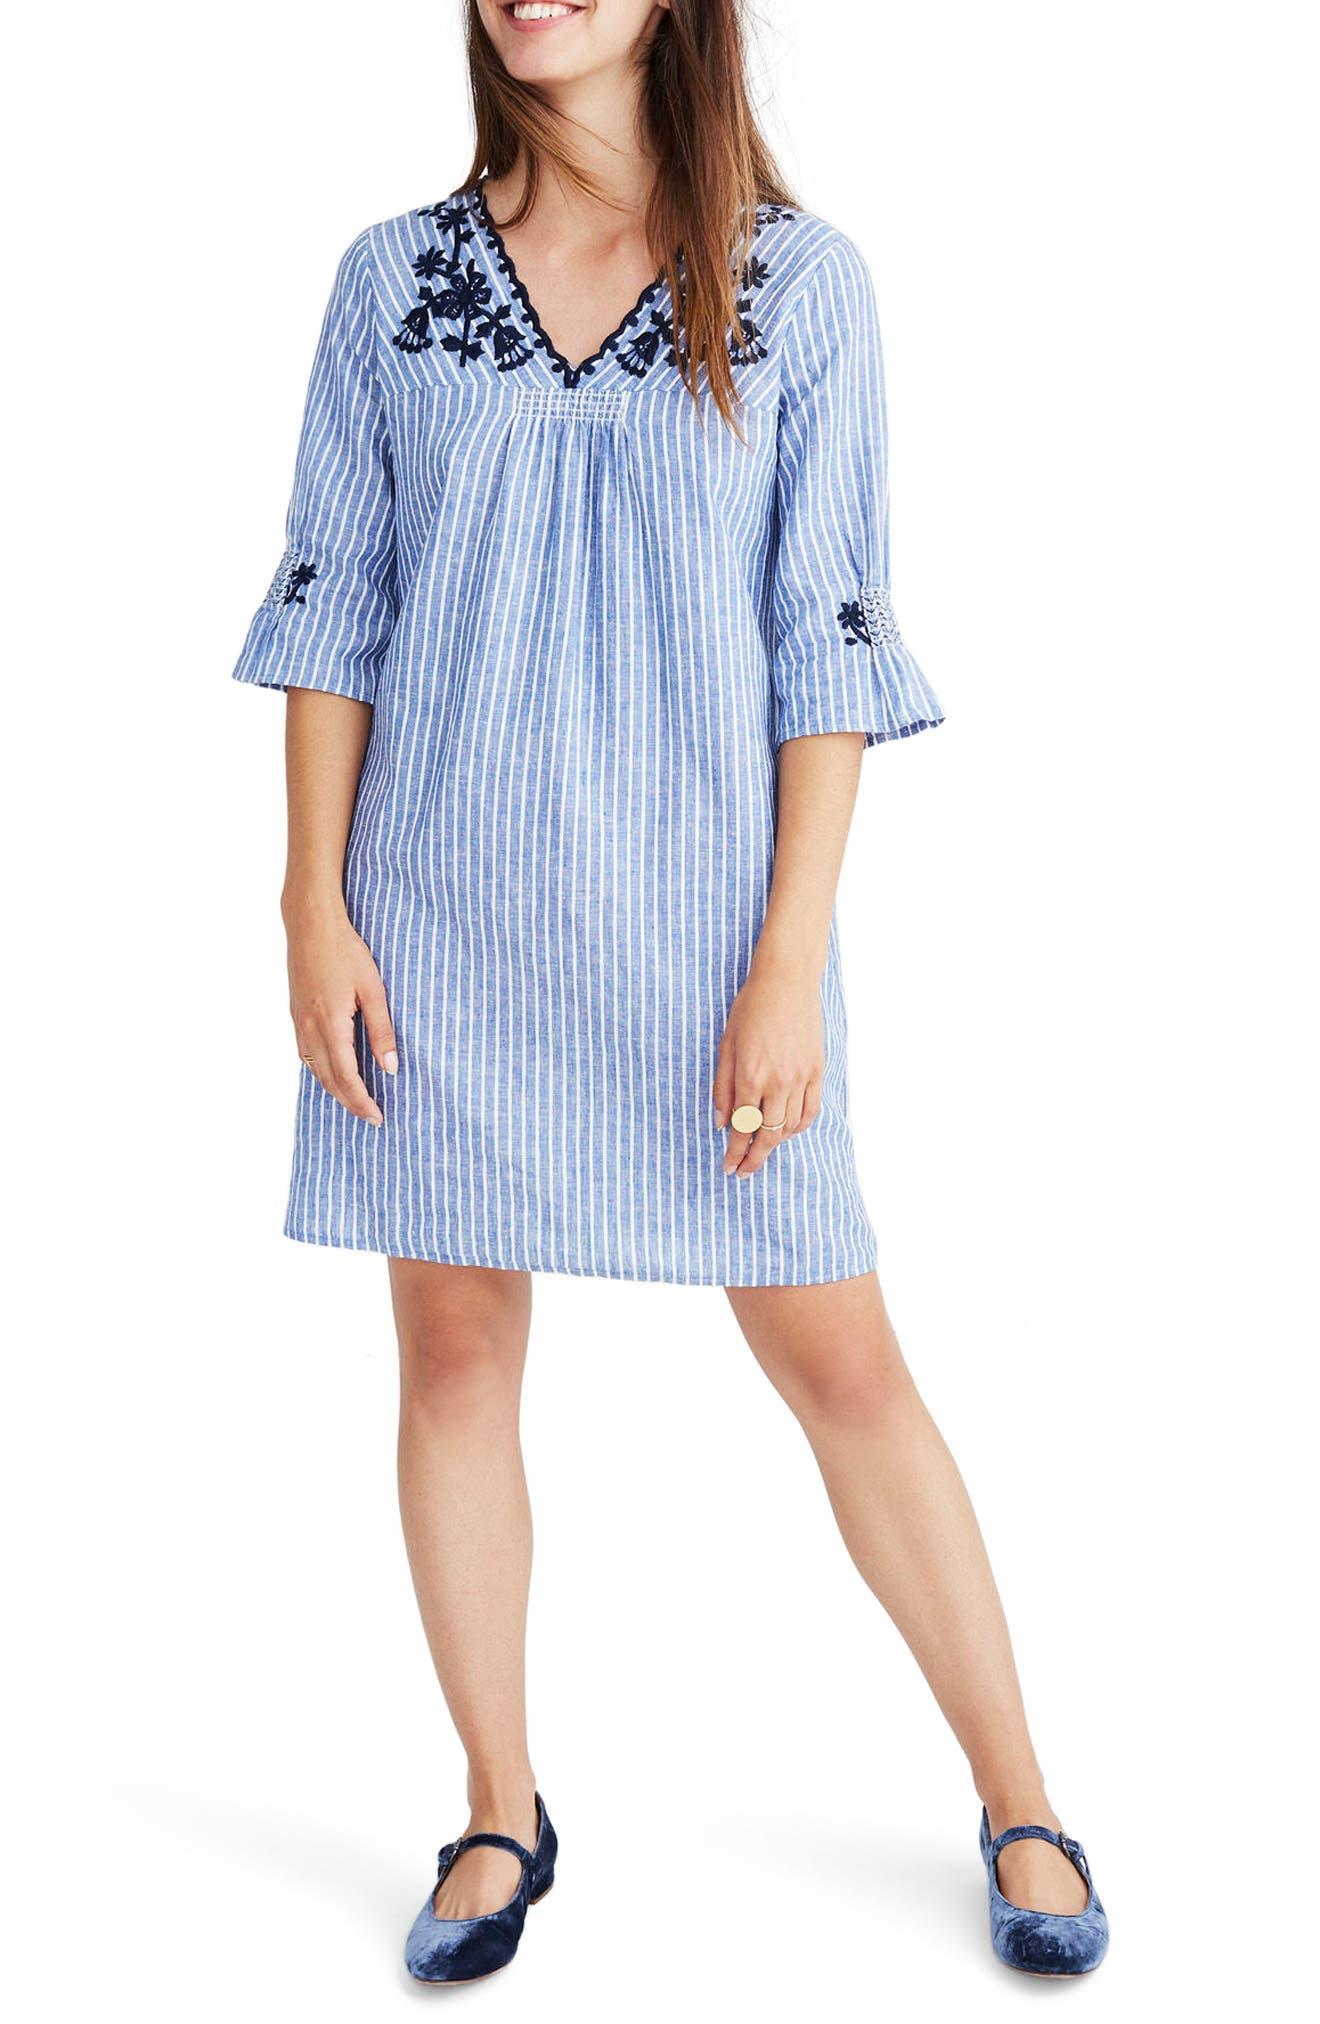 Breeze Embroidered Shift Dress,                         Main,                         color, Brilliant Royal